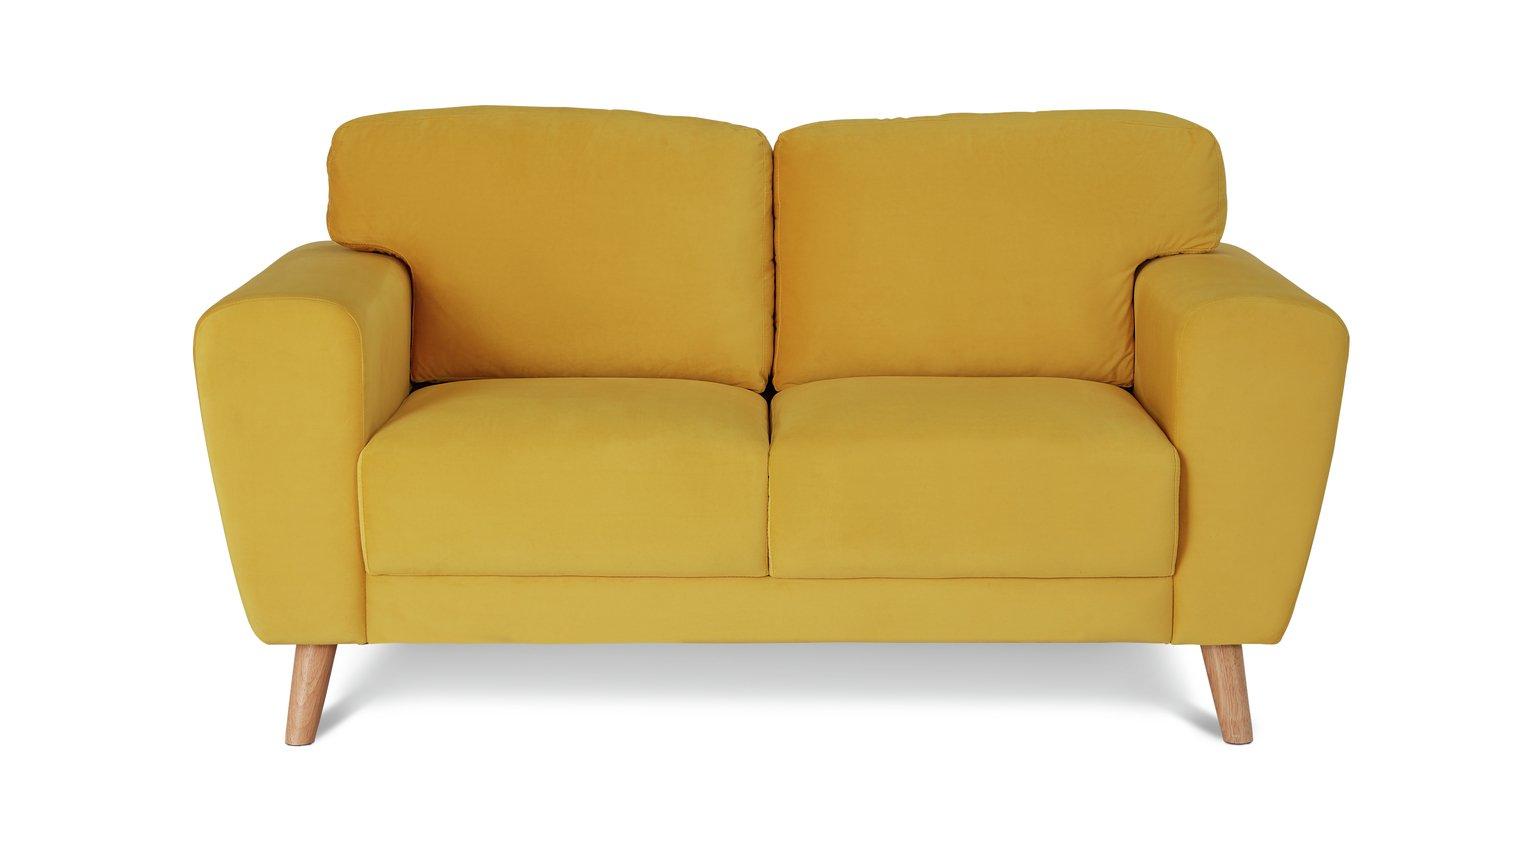 Habitat Snuggle 2 Seater Velvet Sofa - Yellow